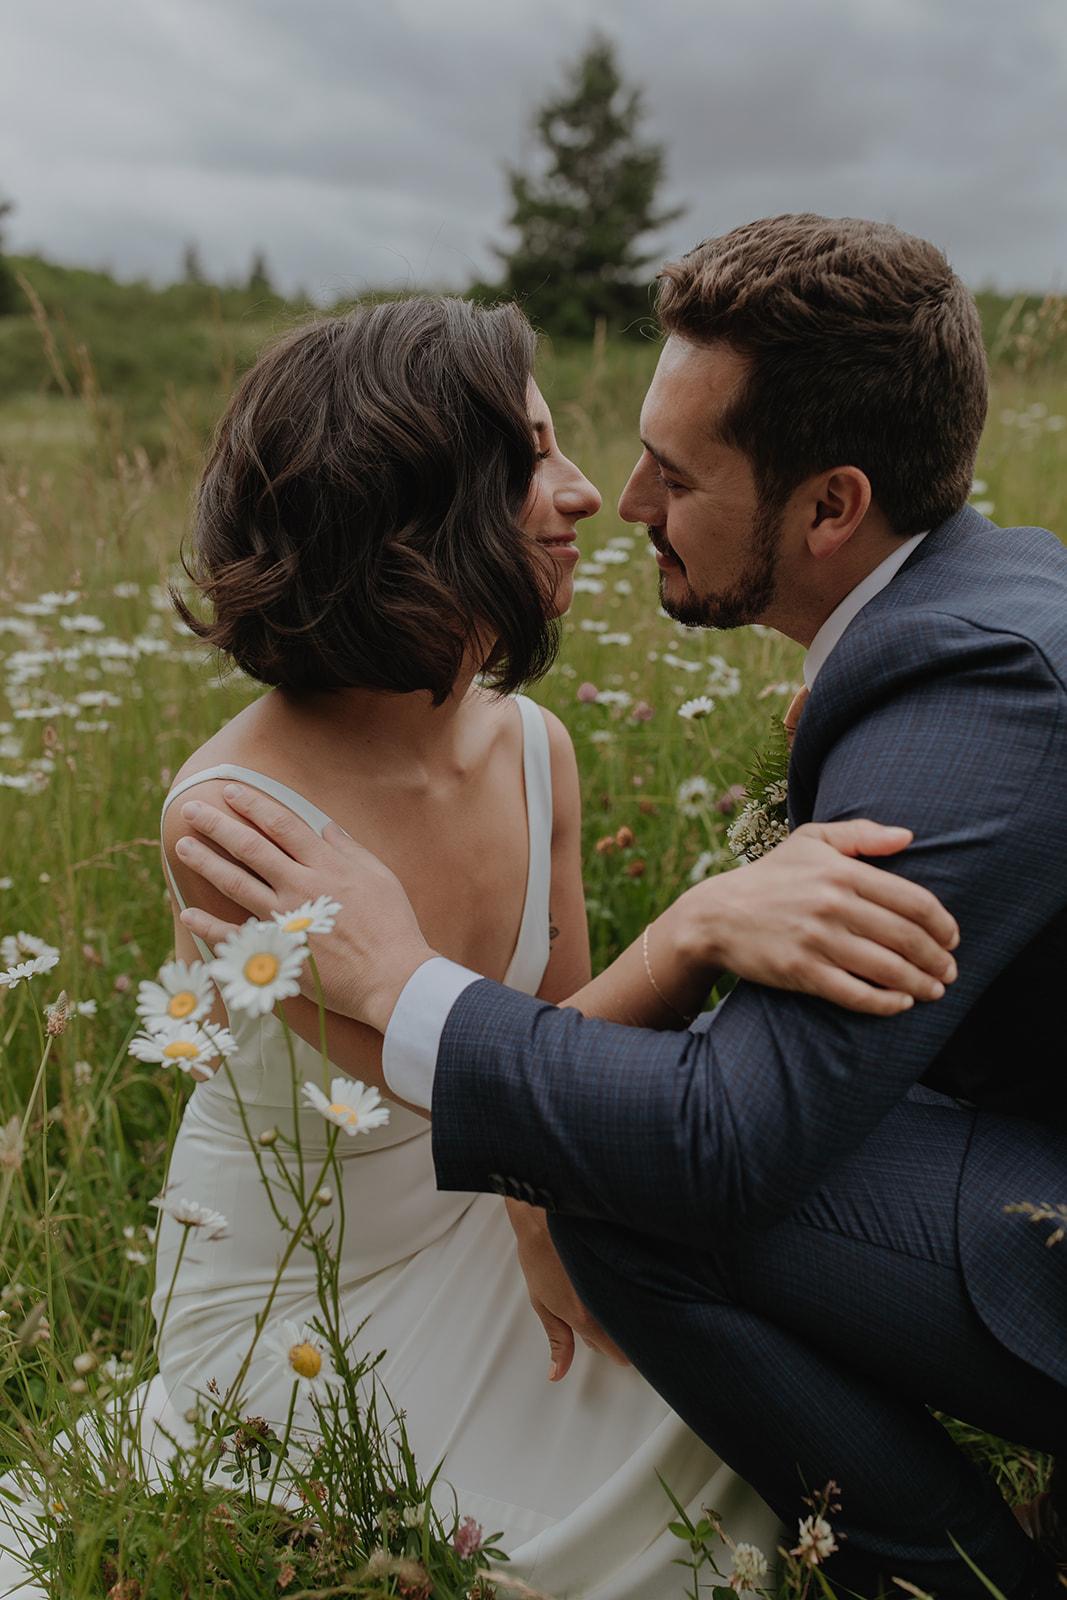 cortney_skye_wedding_june2019-150.jpg